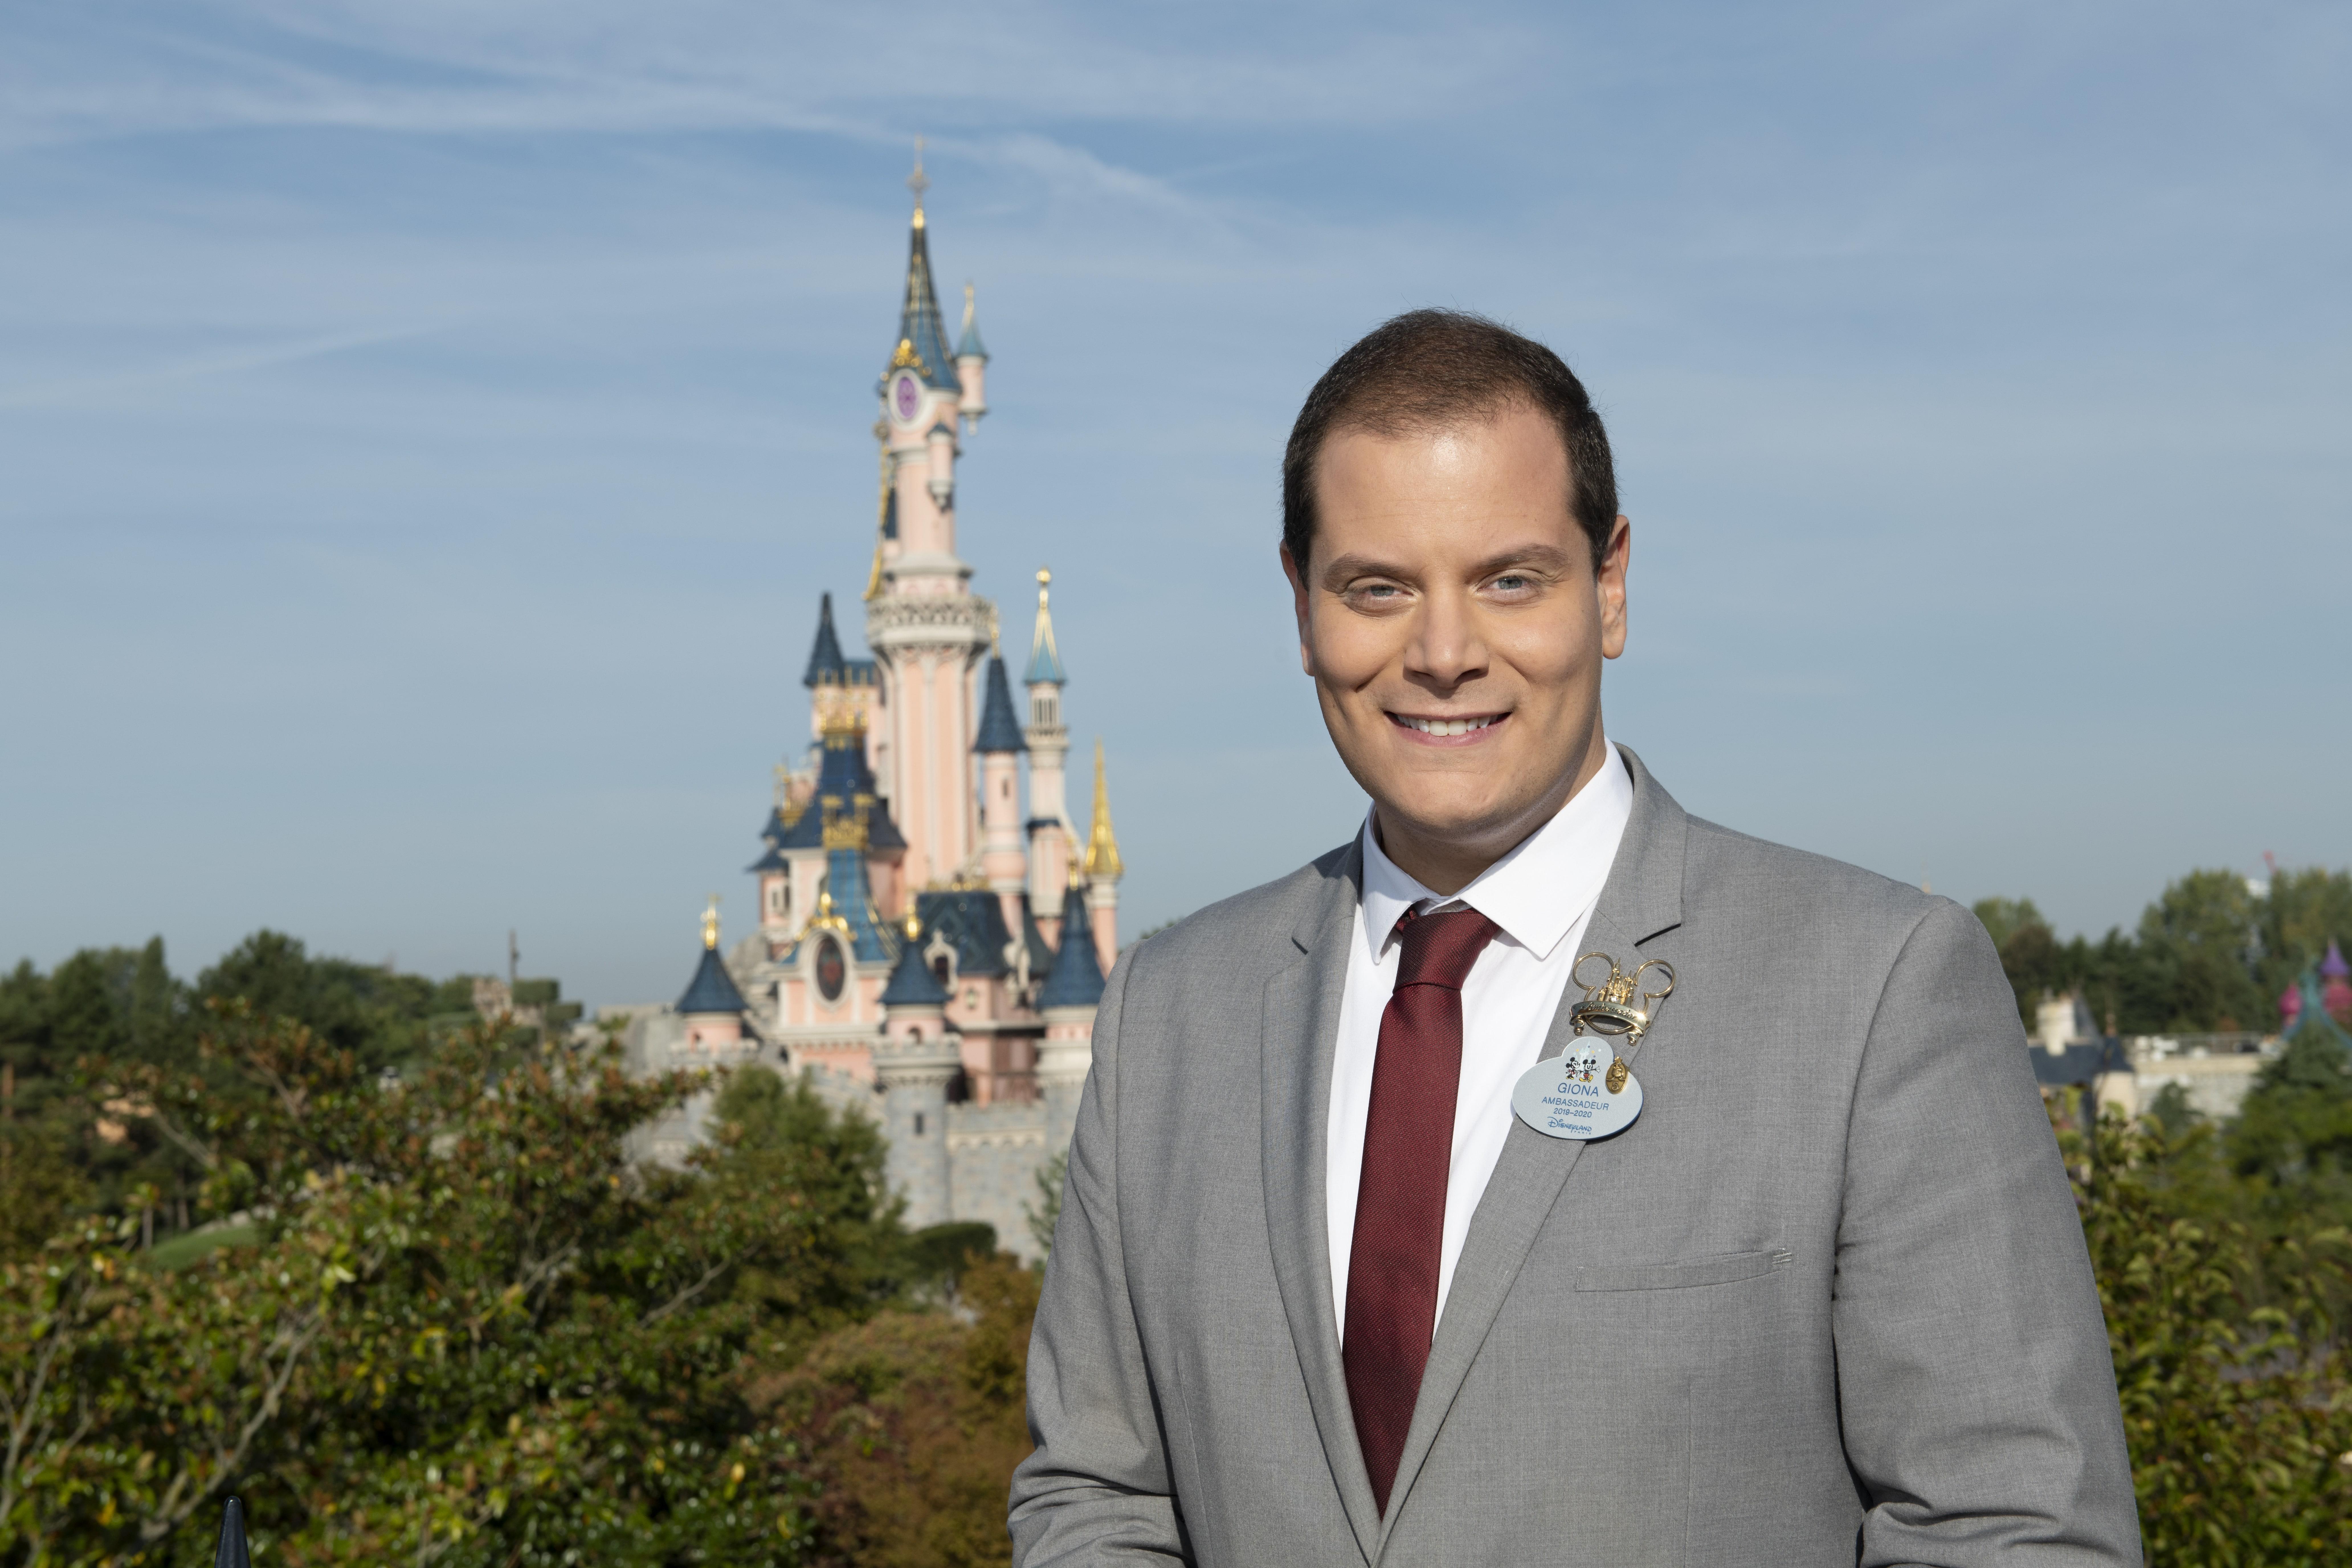 Giona Prevete Ambassadeur Disneyland Paris 2019-2020